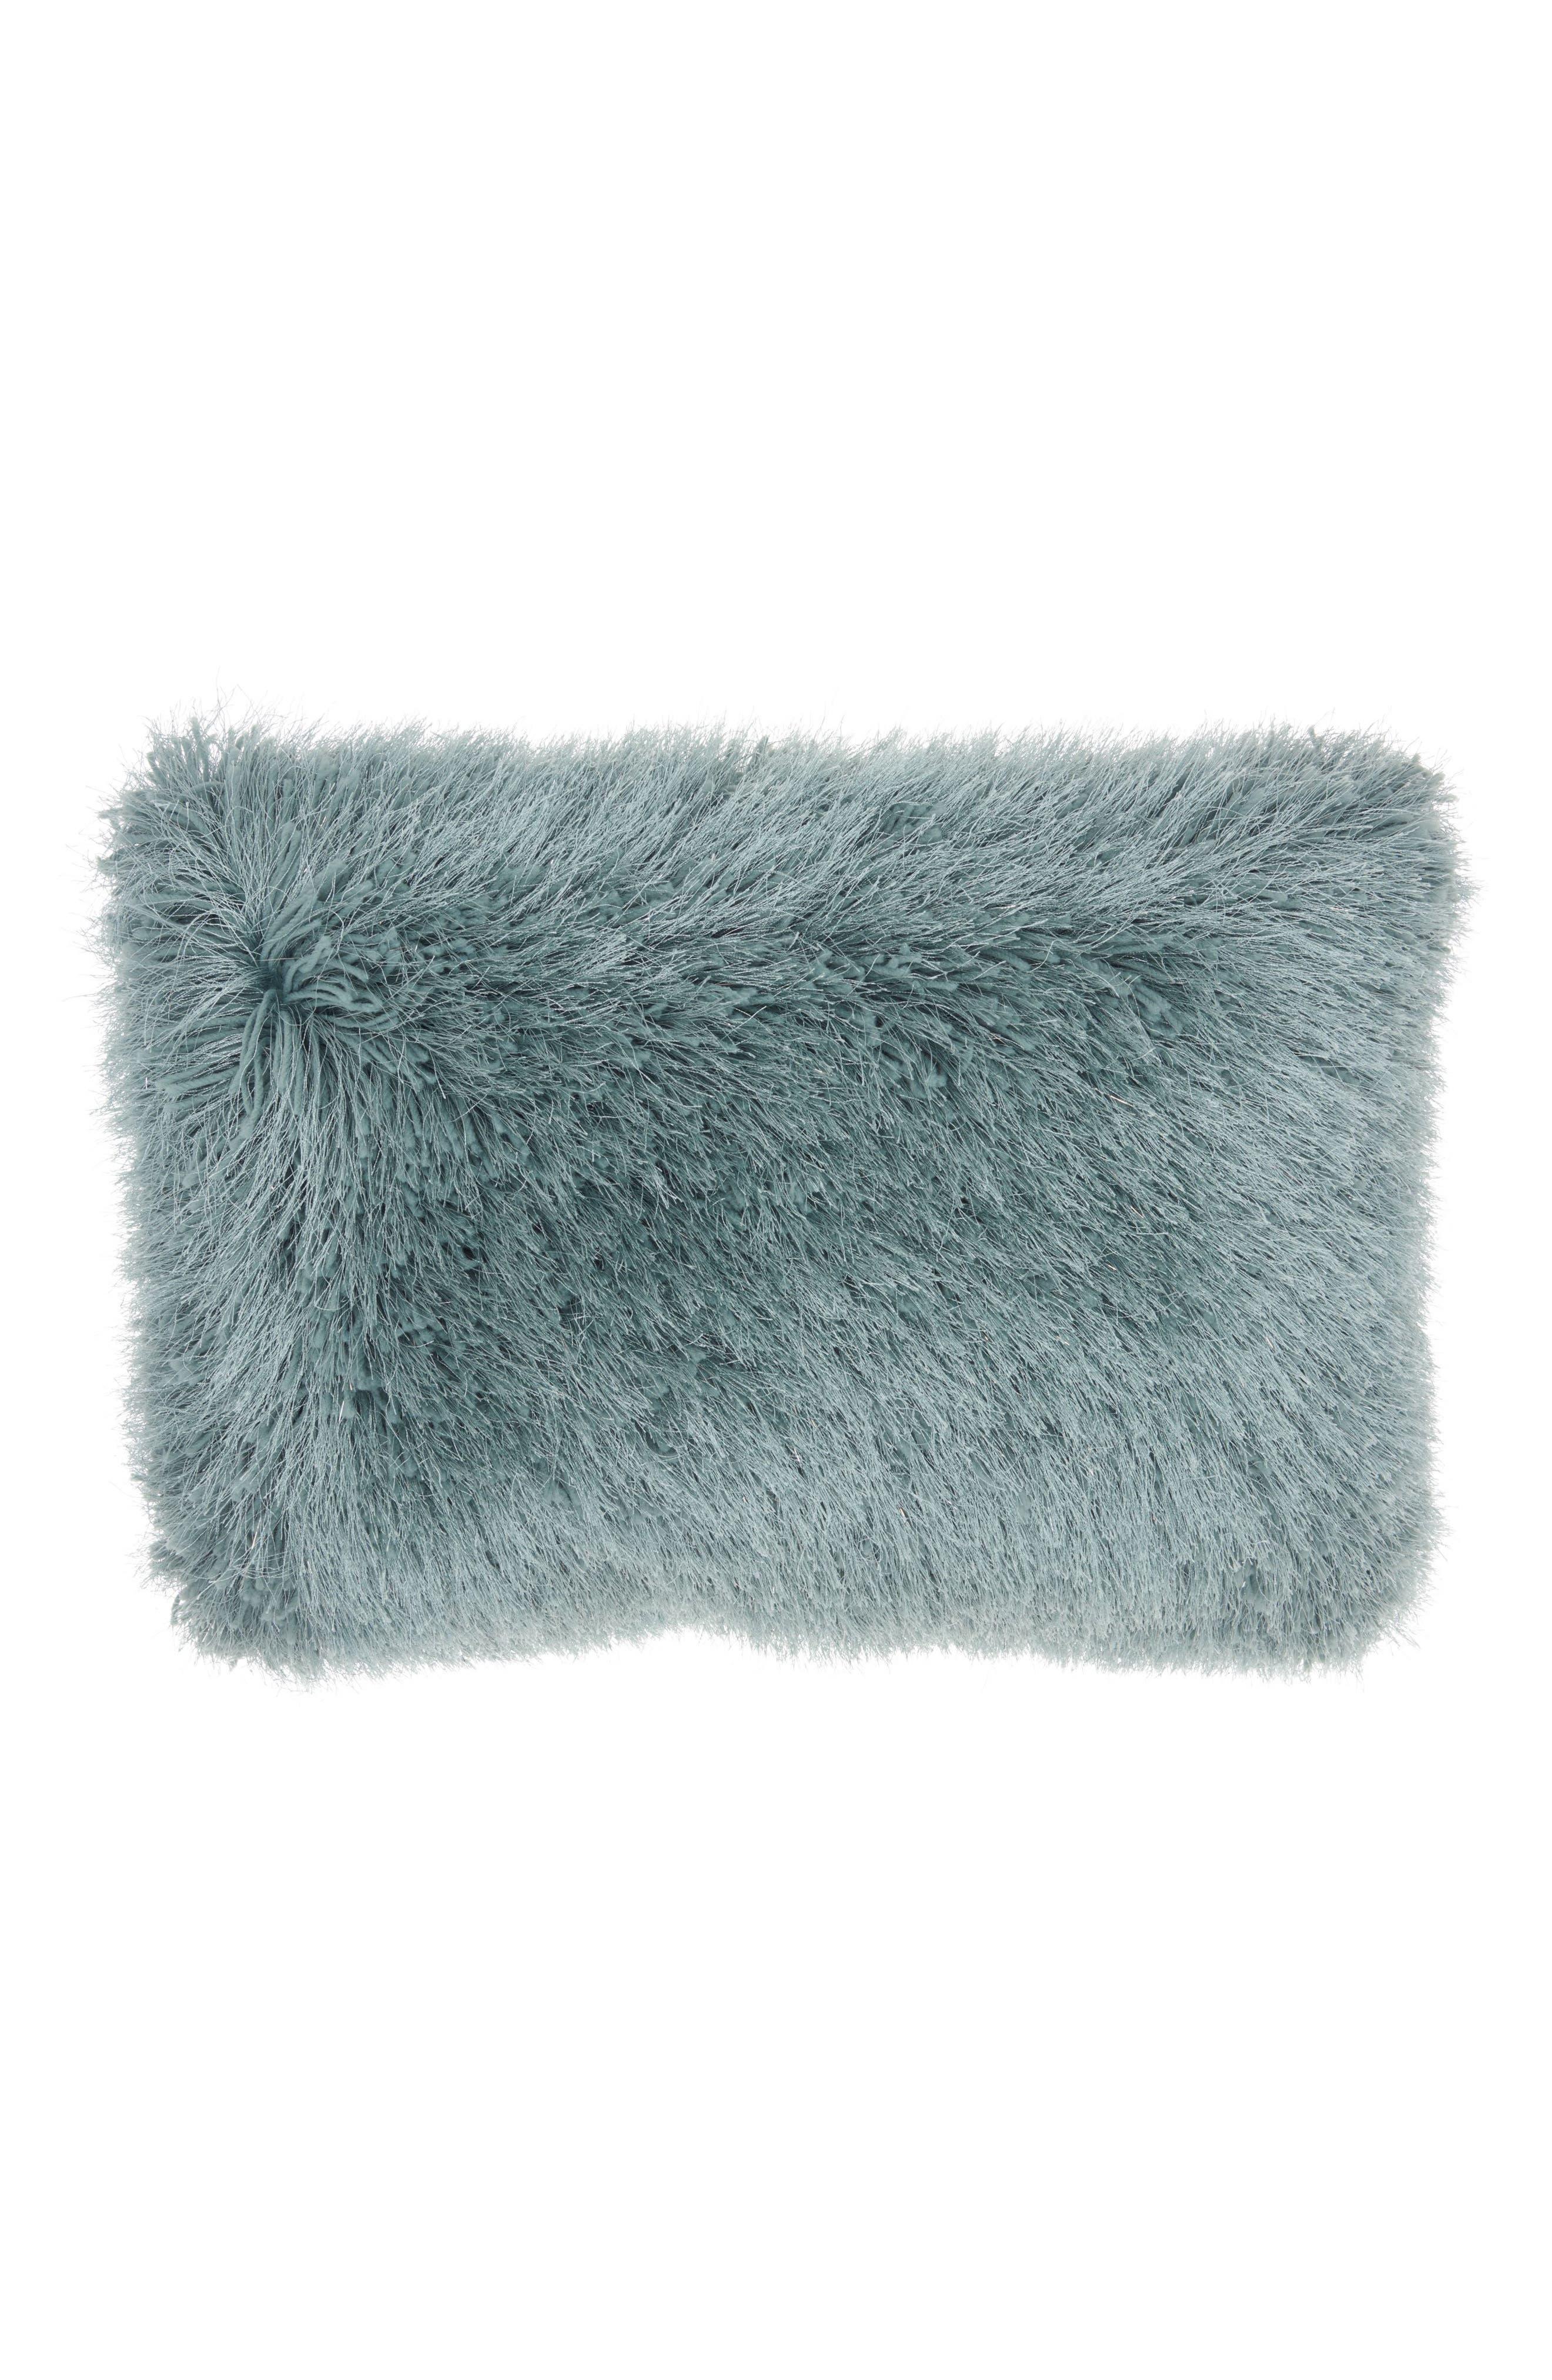 Alternate Image 1 Selected - Mina Victory Yarn Shimmer Shag Pillow